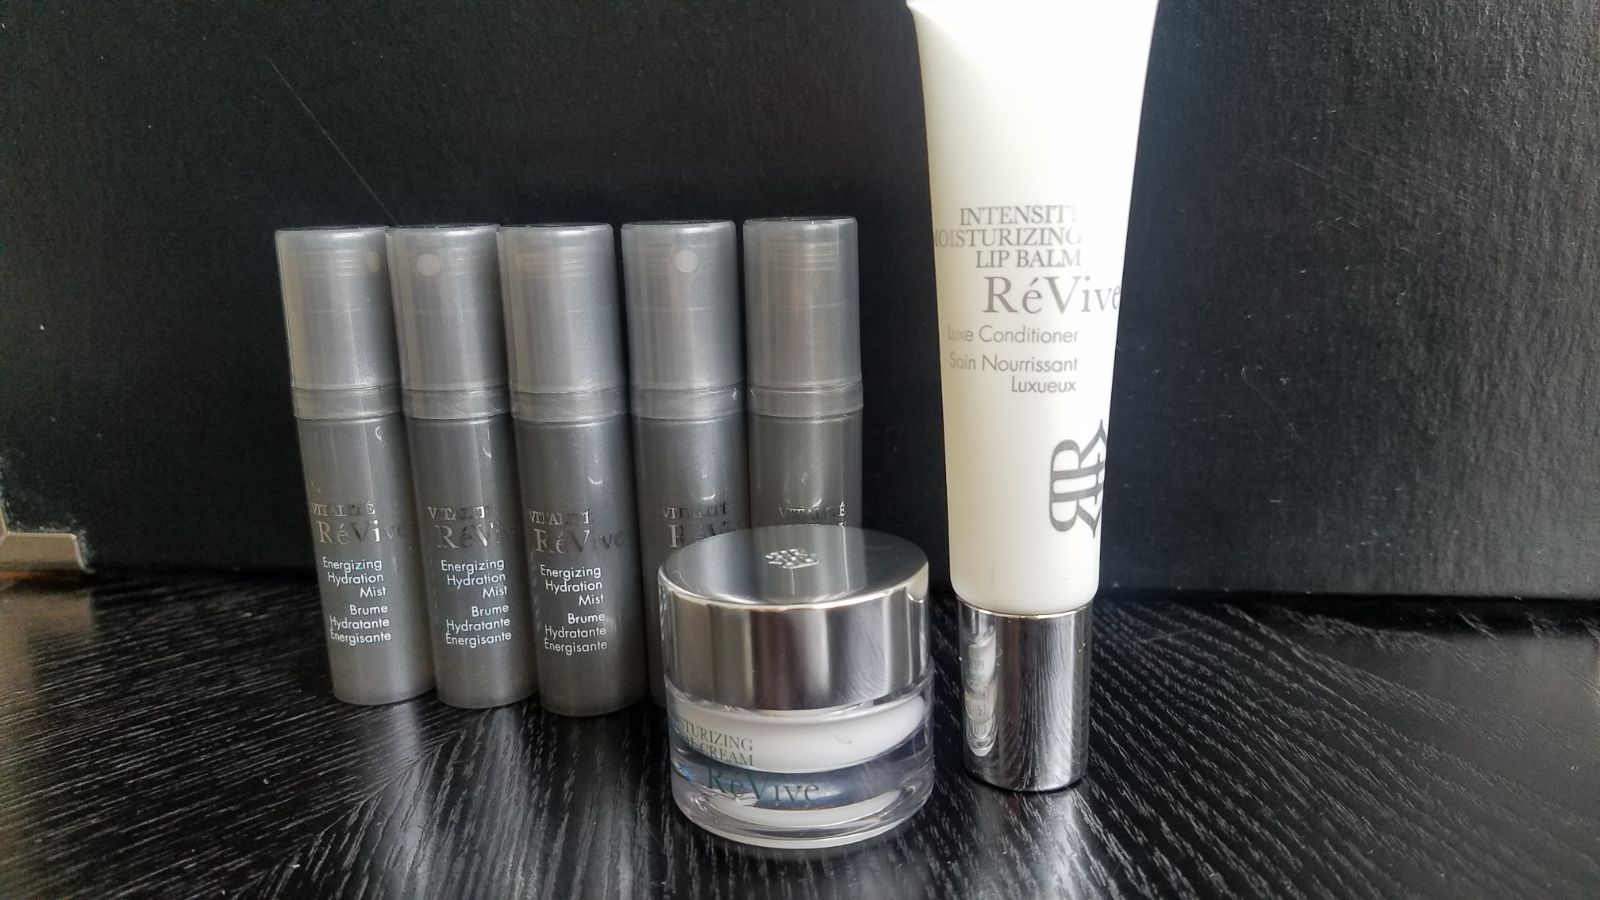 Revive Renewal Cream Mist Lip Balm